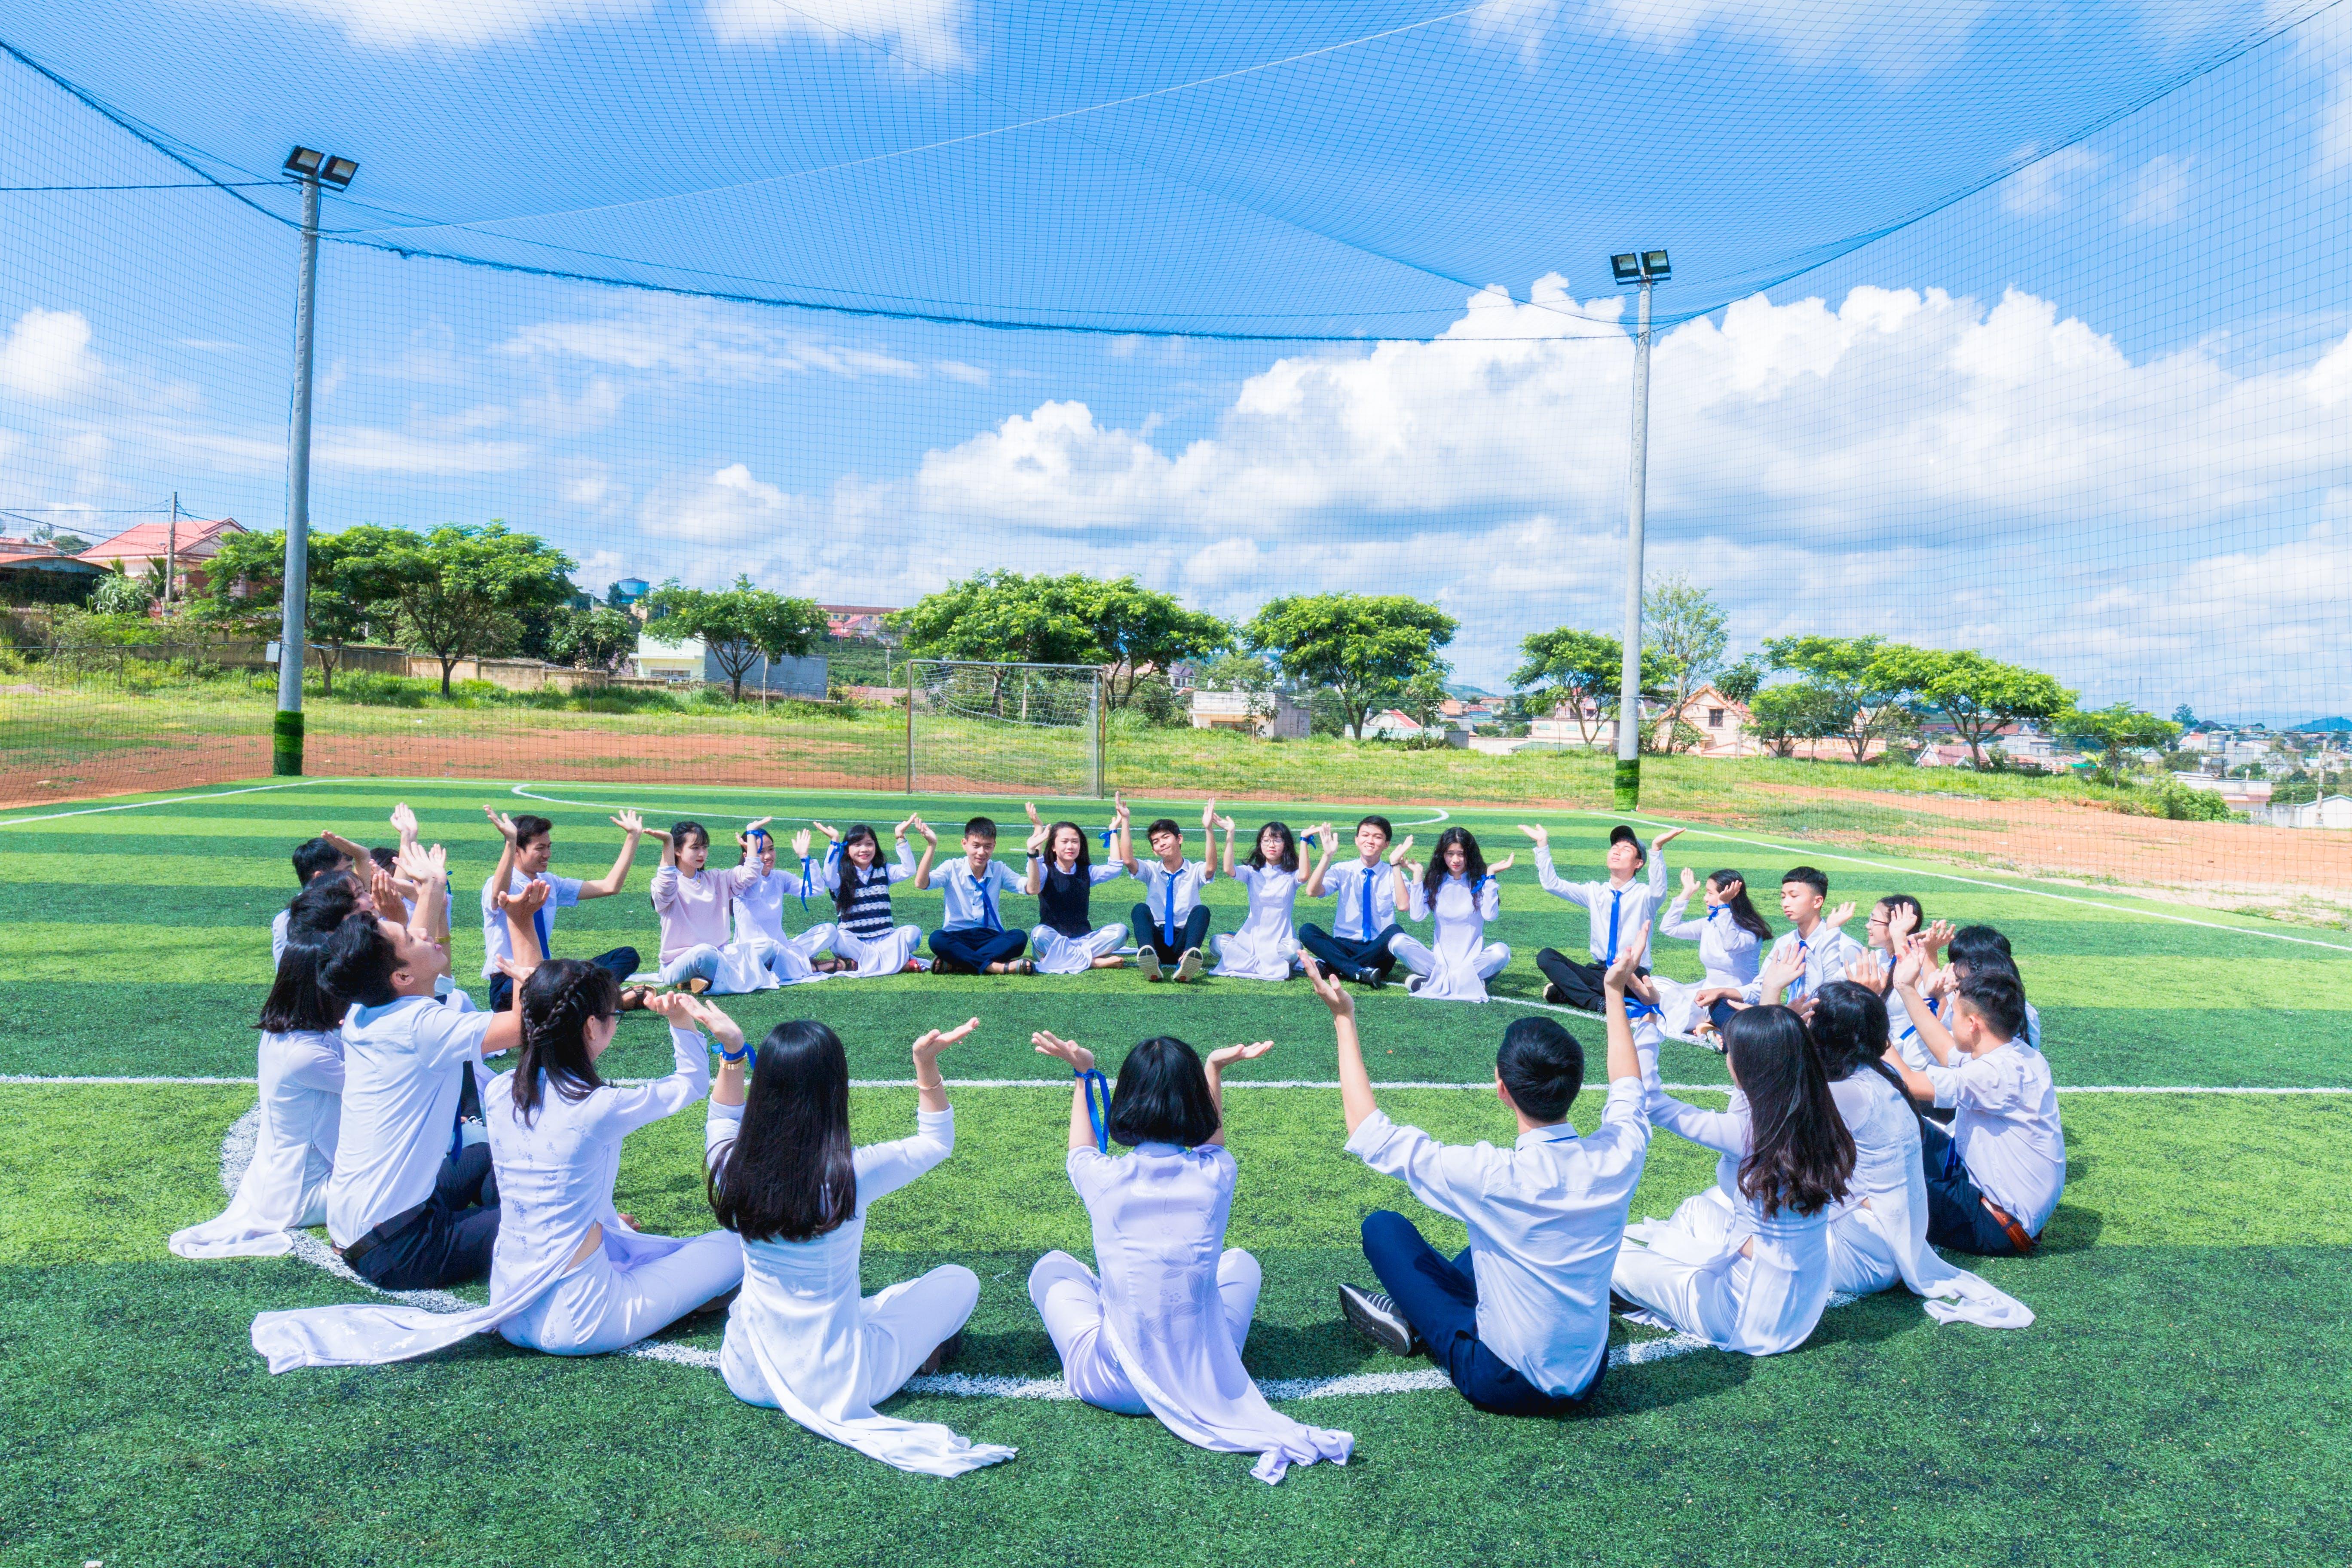 People Sitting on Green Grass Field